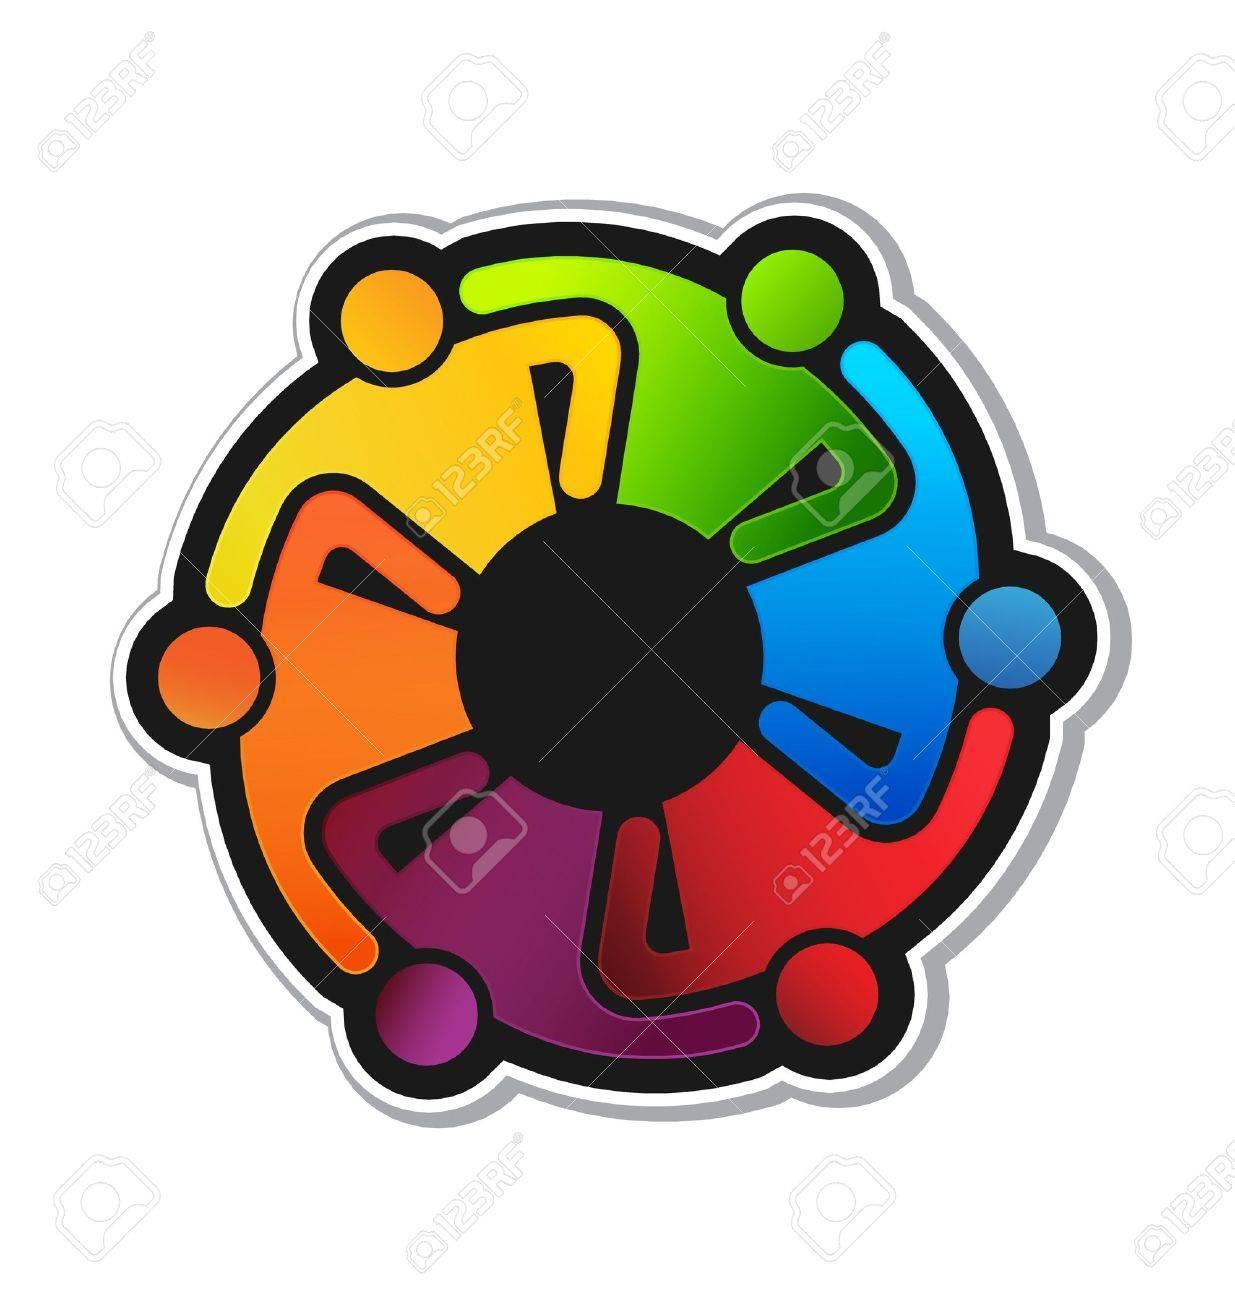 Teamwork Hugging 6 sticker Stock Vector - 22075958